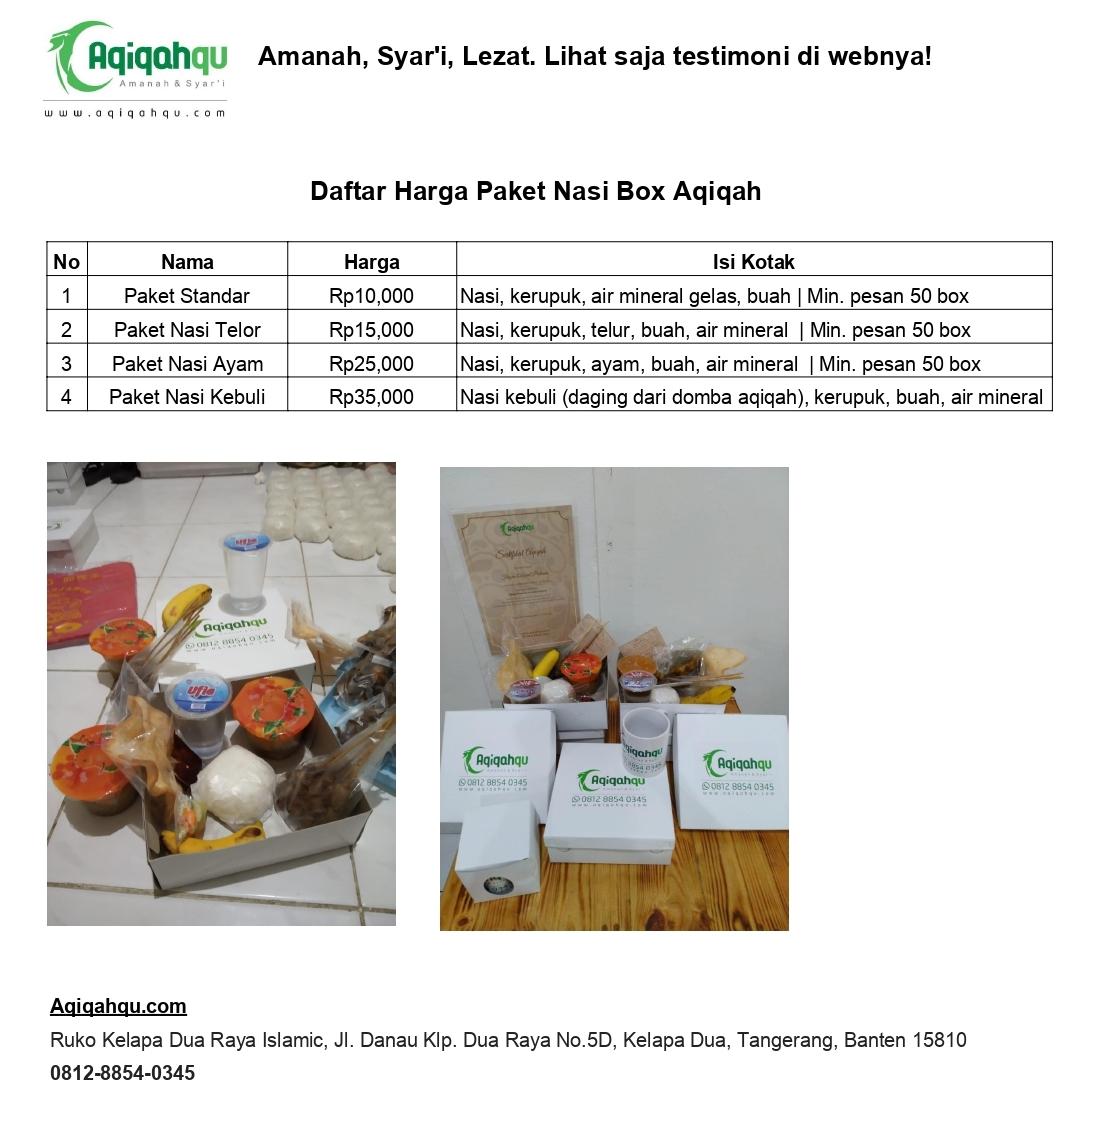 Daftar Harga Paket Nasi Box Aqiqah